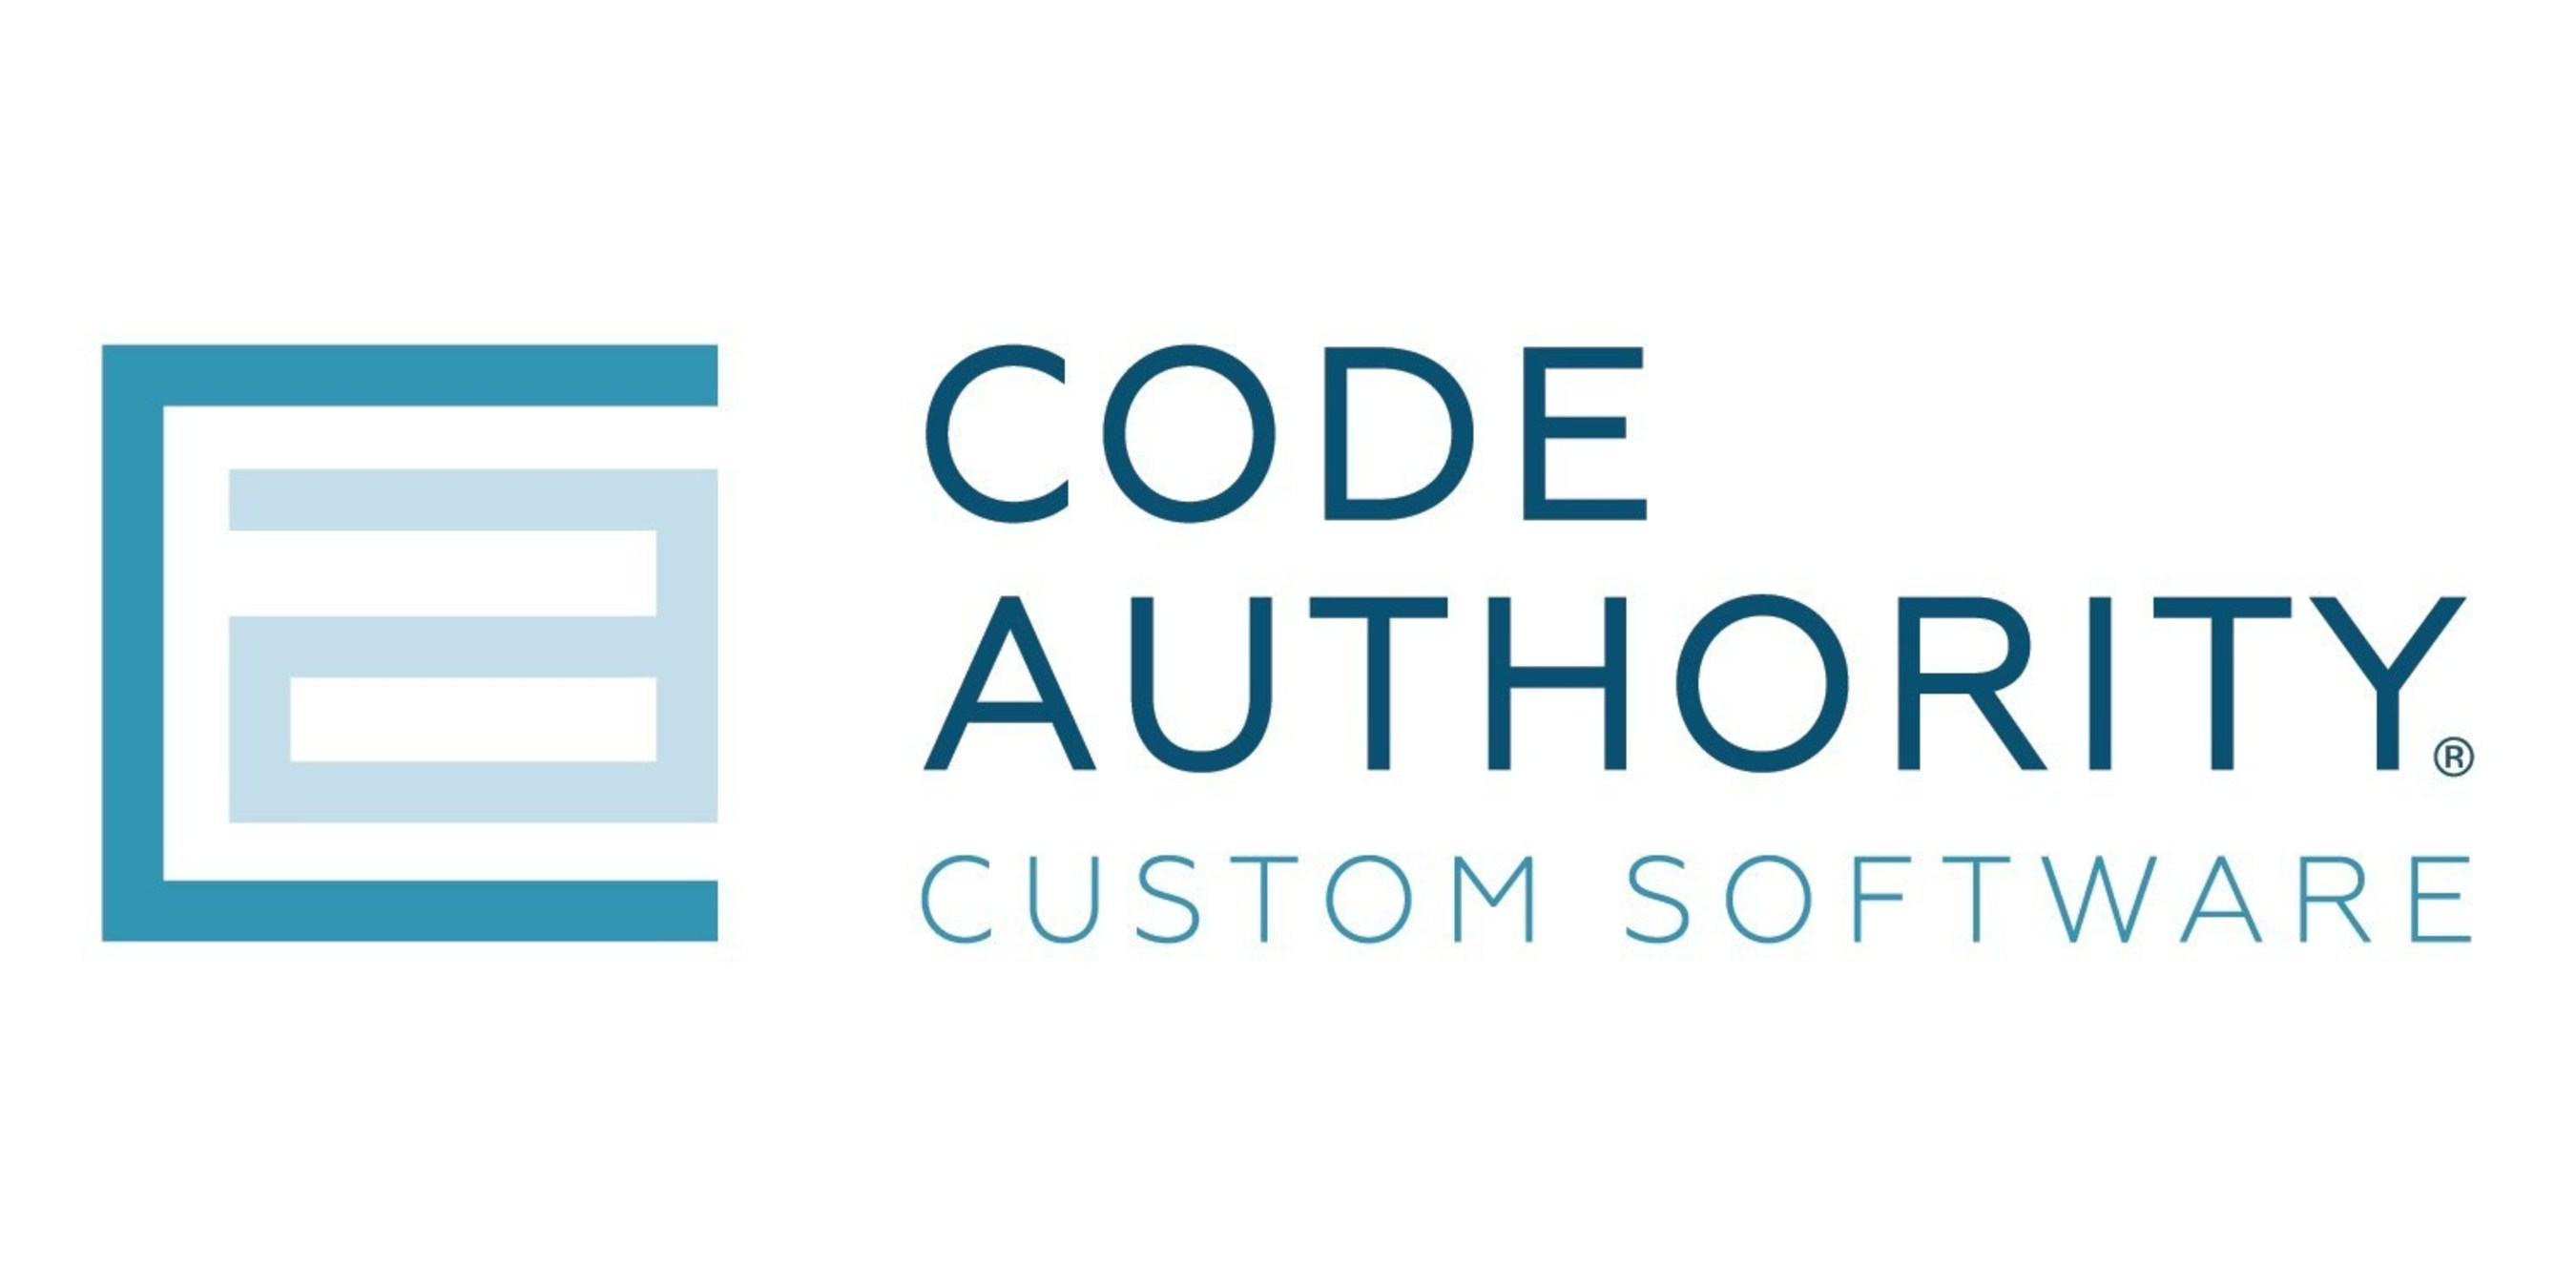 Code Authority custom software